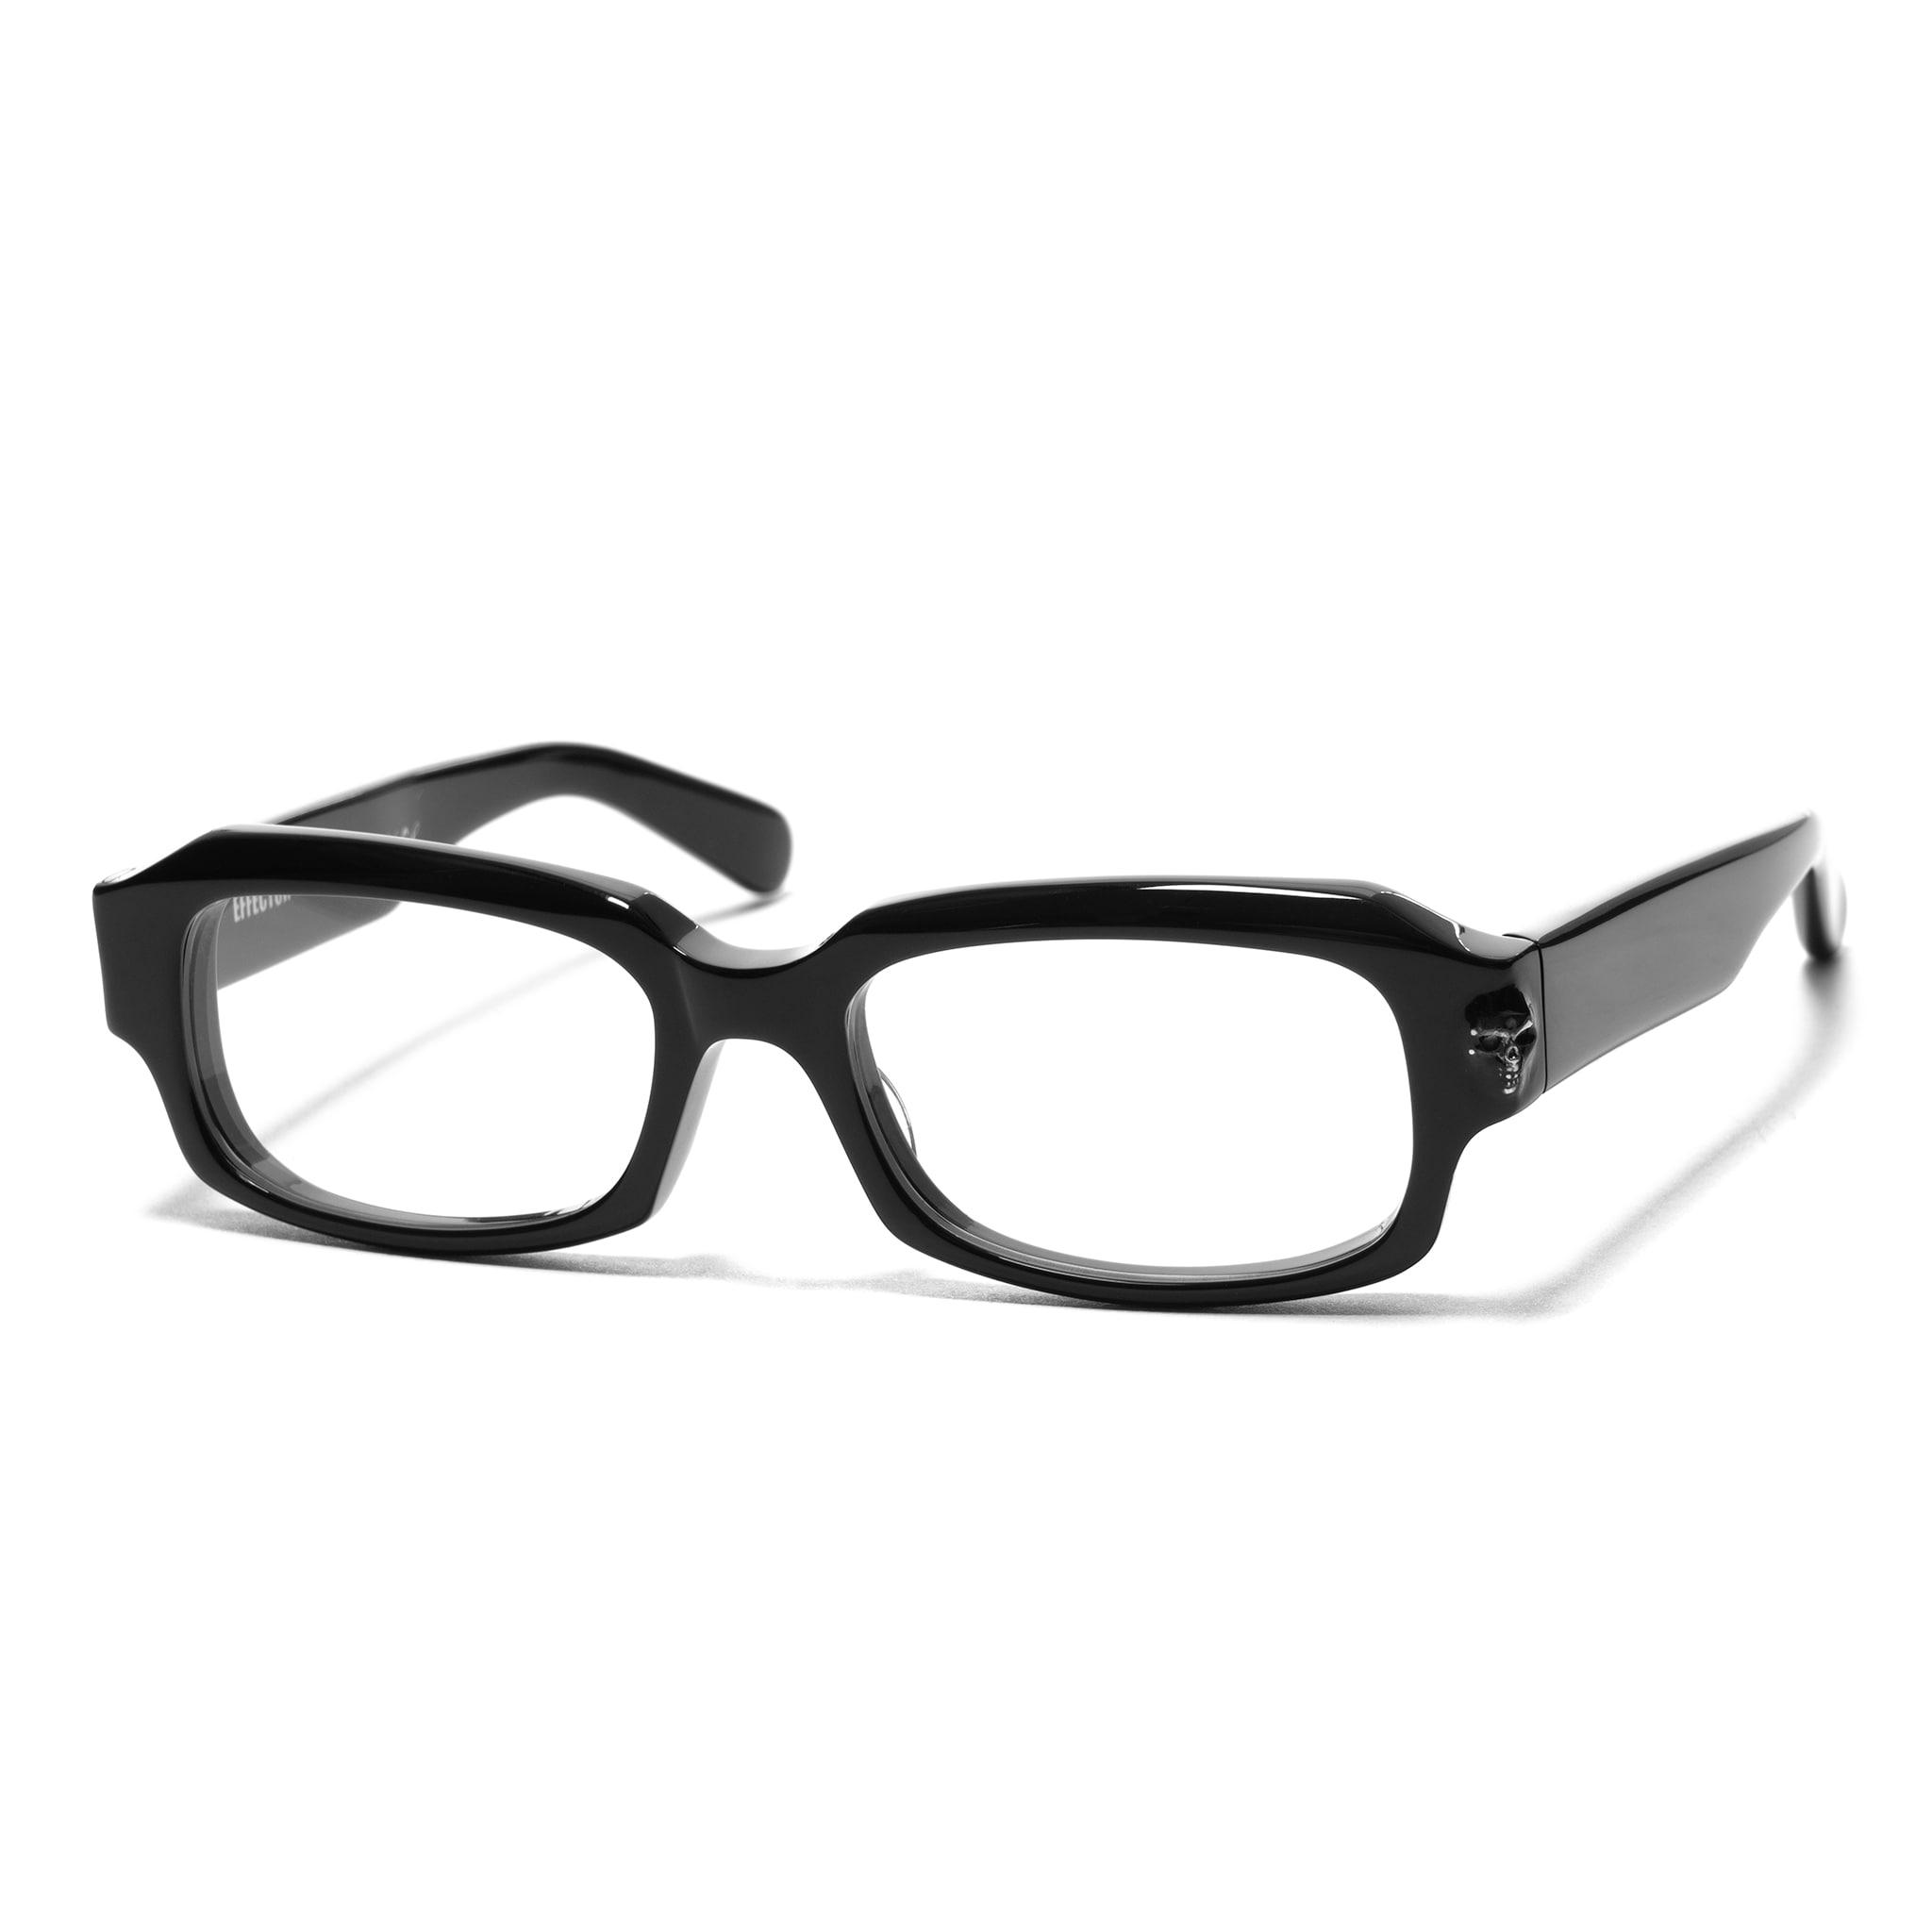 60c98df529 x EFILEVOL AW Optical Black.  430.00. x GIGOR Gigor Type1 Optical Black.  EFFECTOR